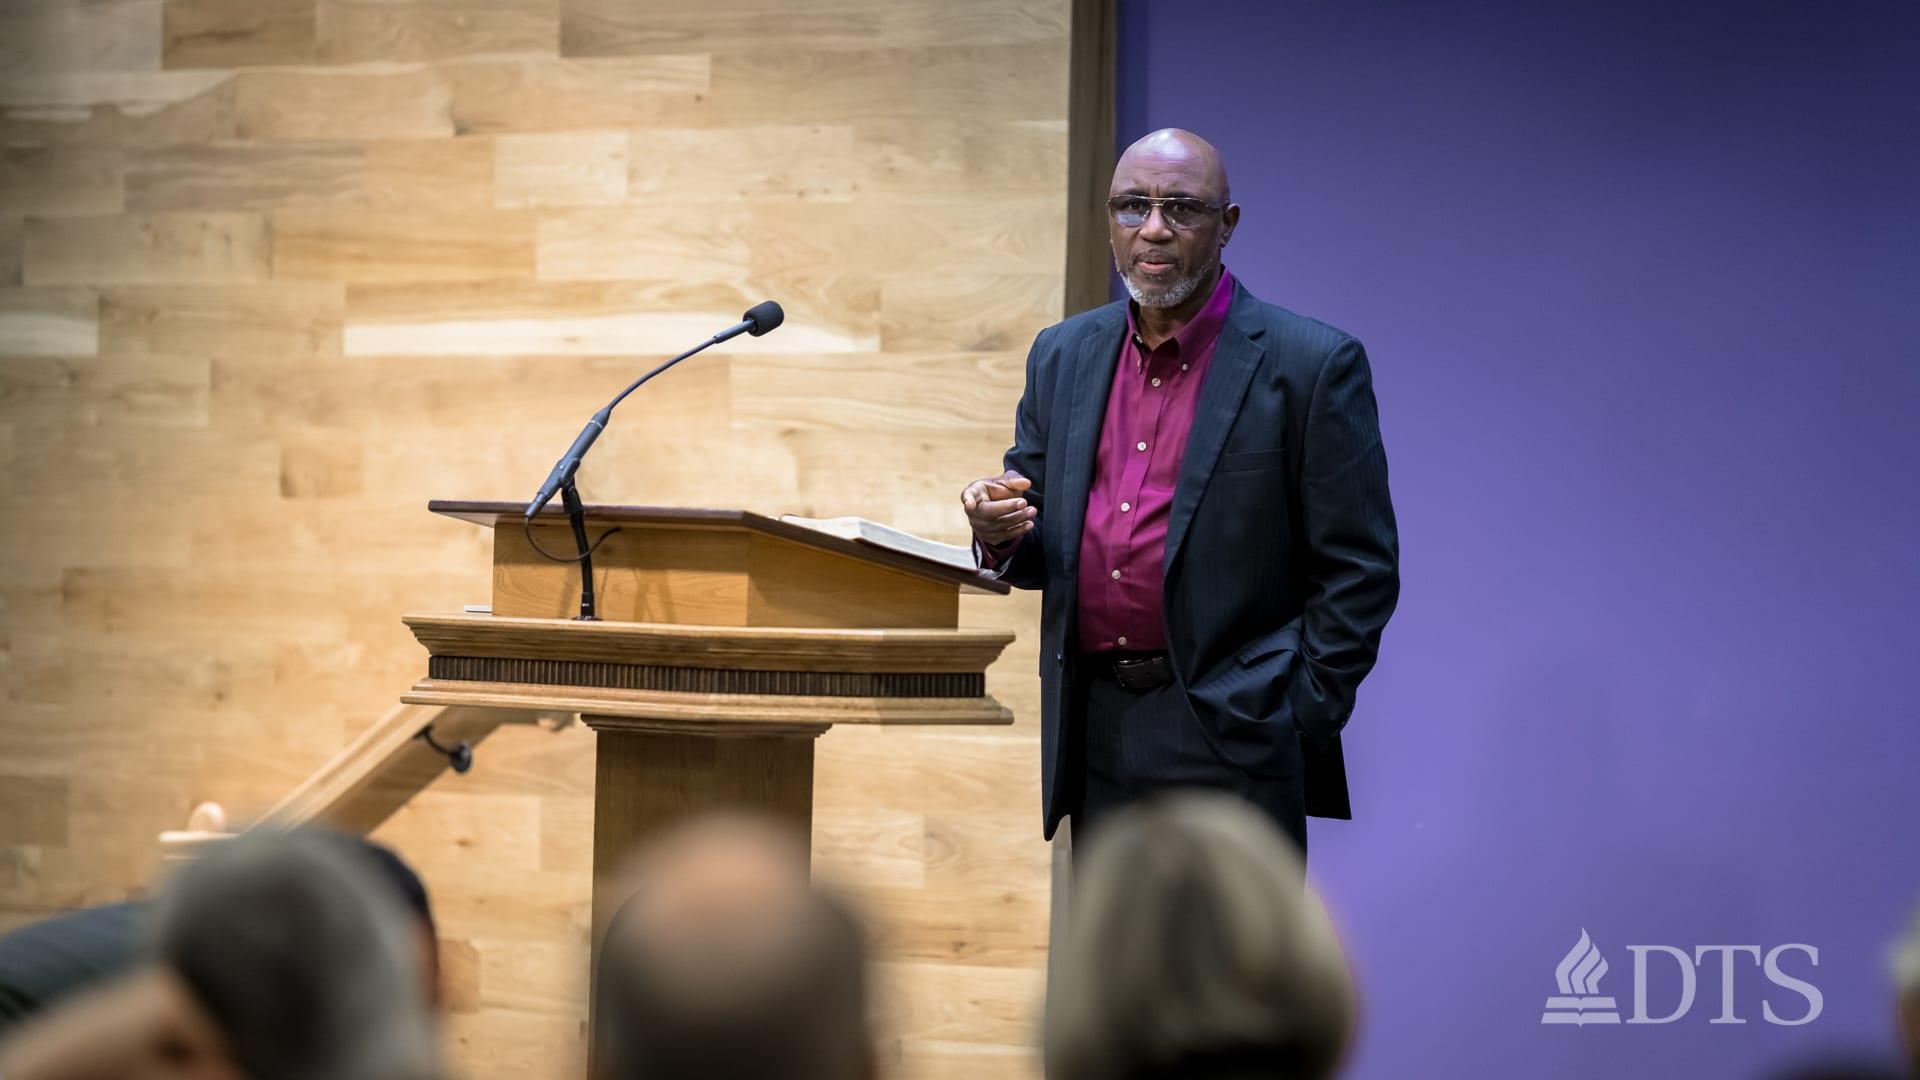 man standing next to podium speaking at DTS Chapel